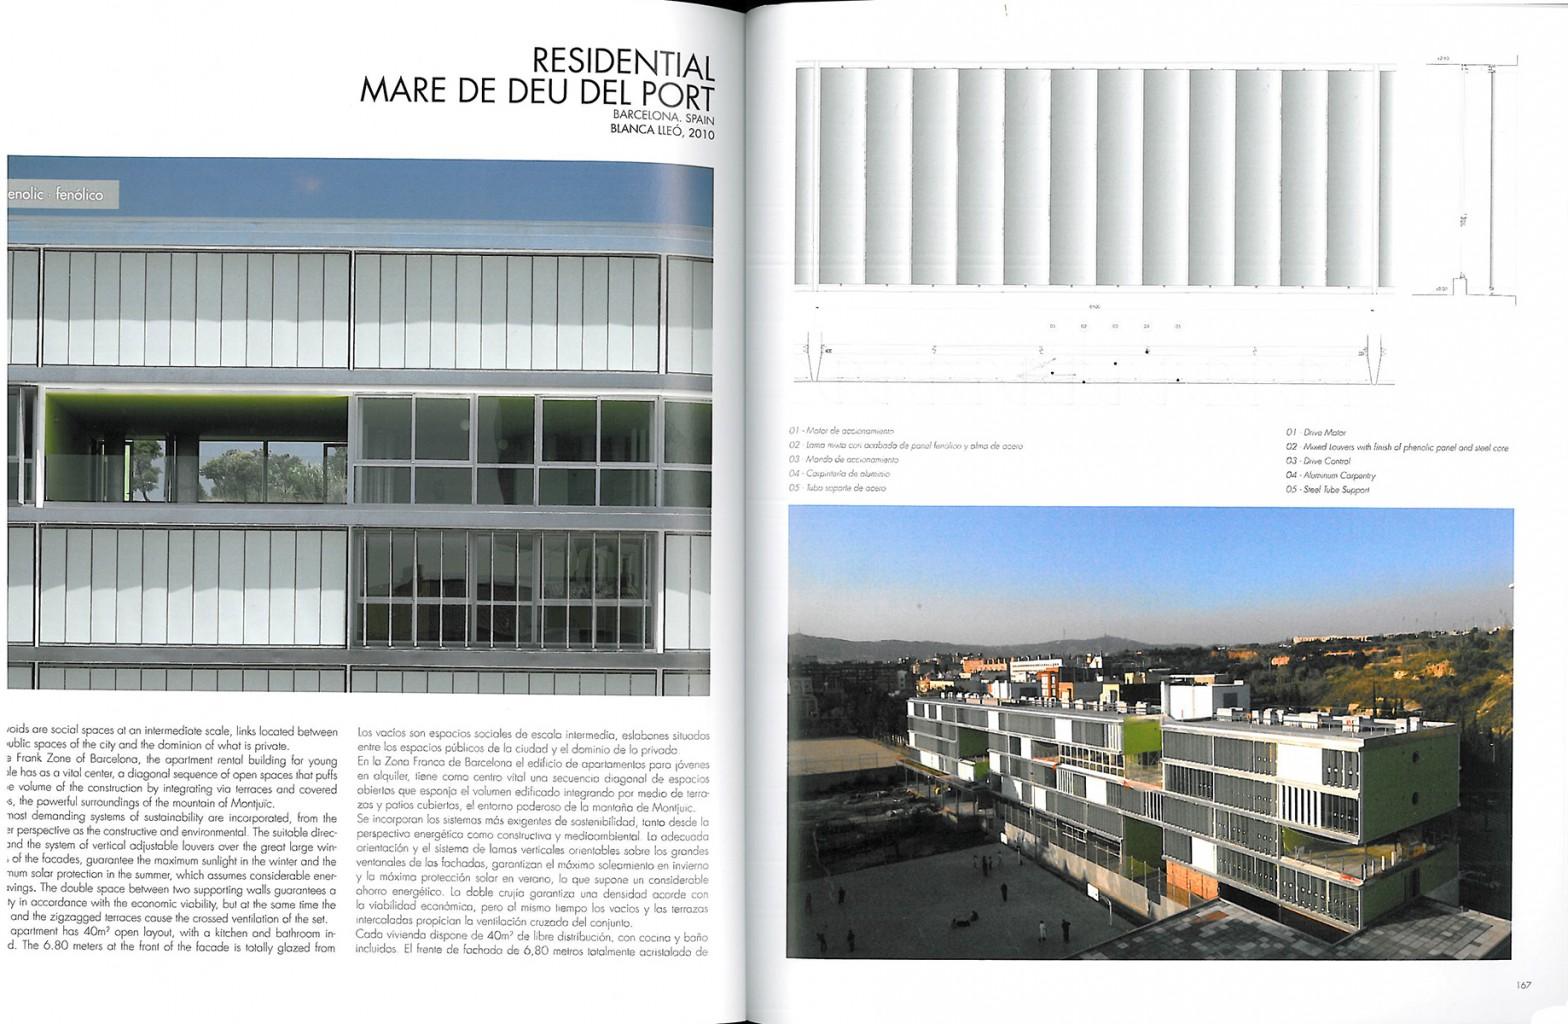 Slats façades Blanca Lleó 01